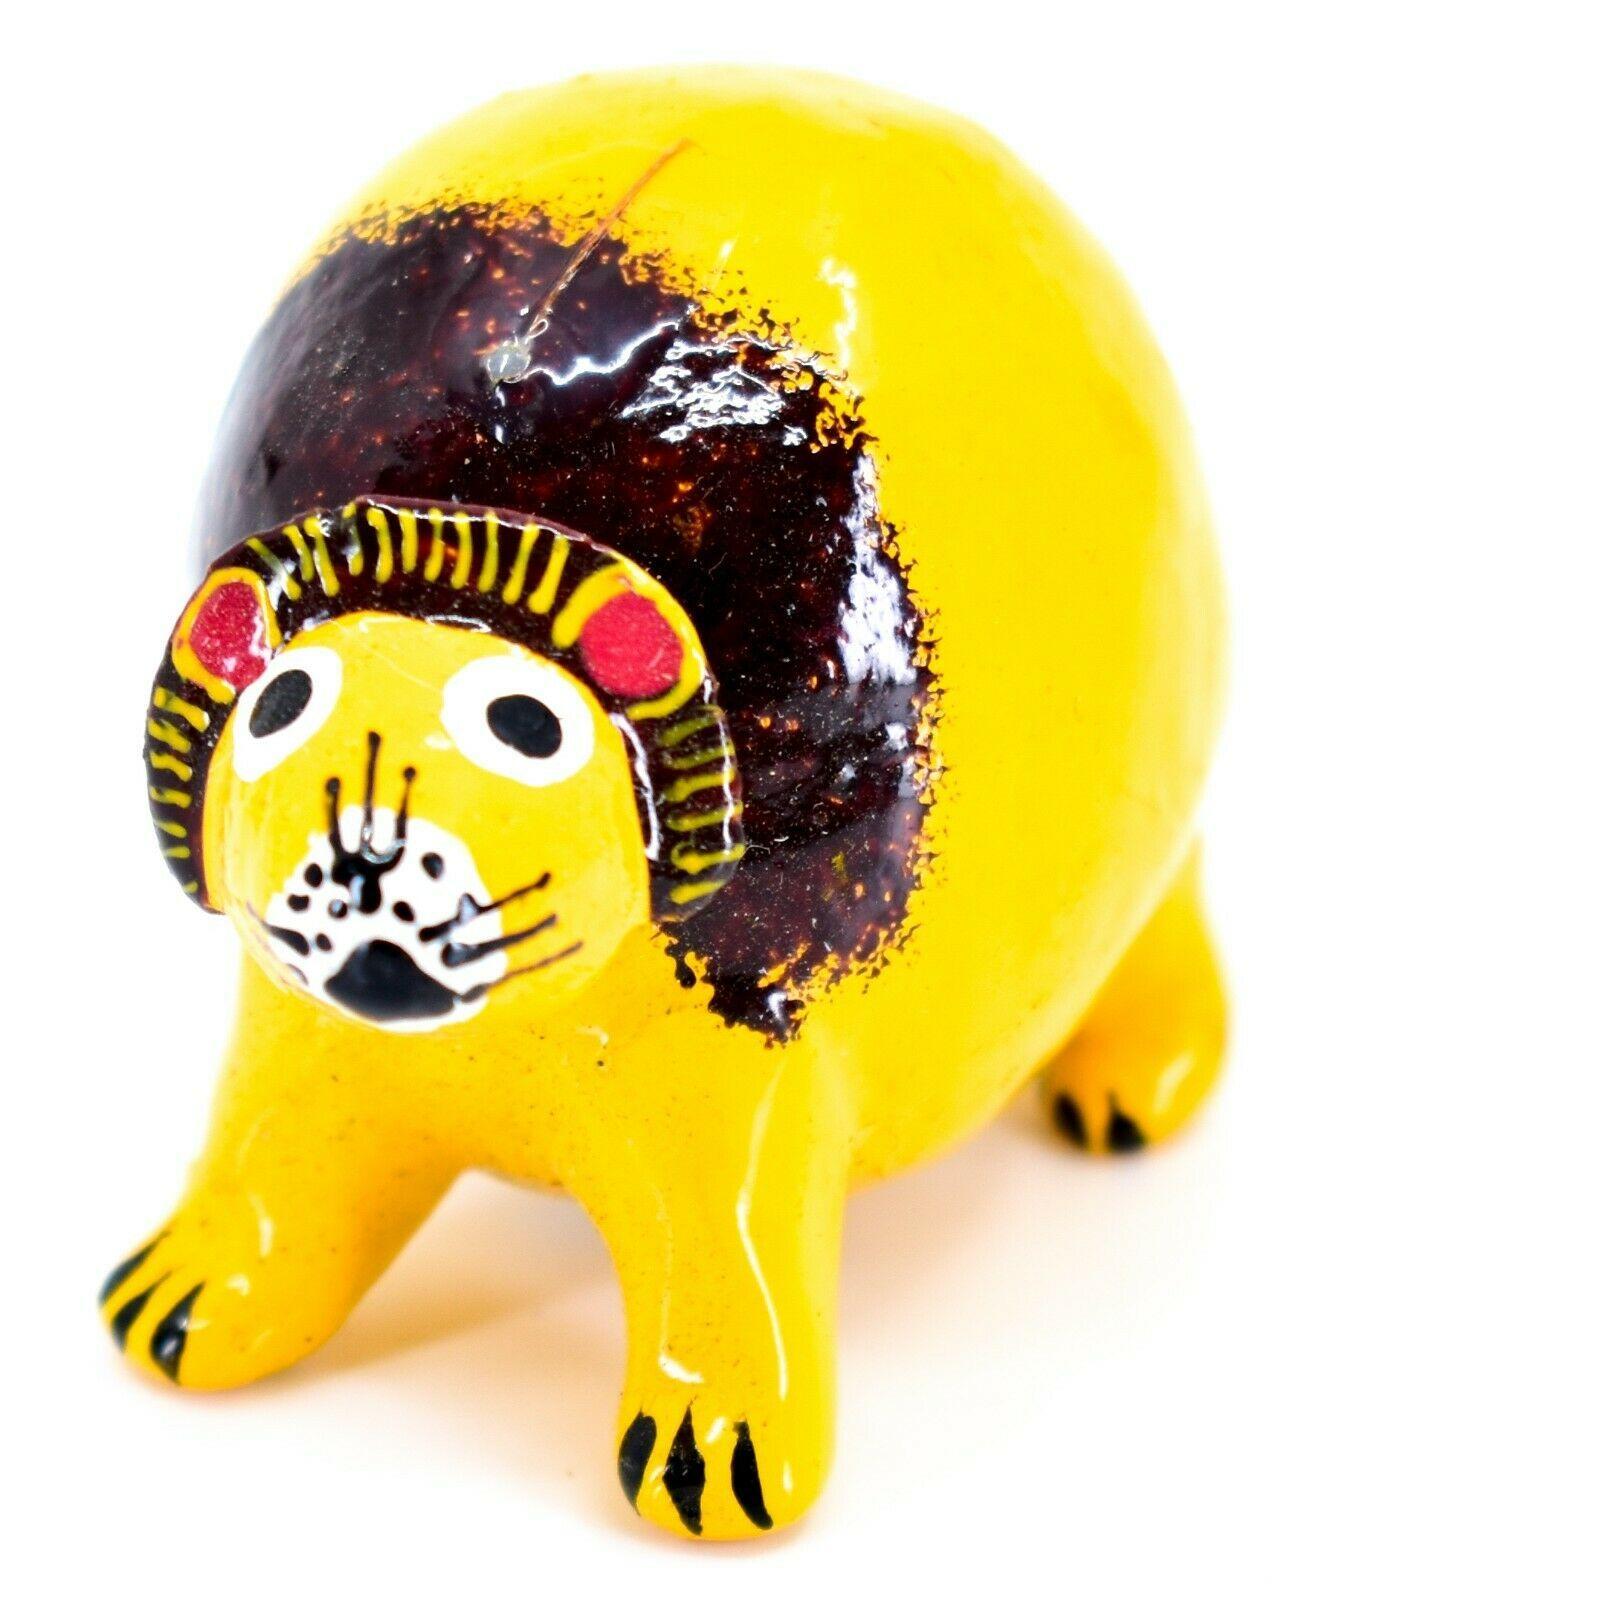 Handmade Alebrijes Oaxacan Wood Carved Folk Art Mini Lion Bobble Head Figurine